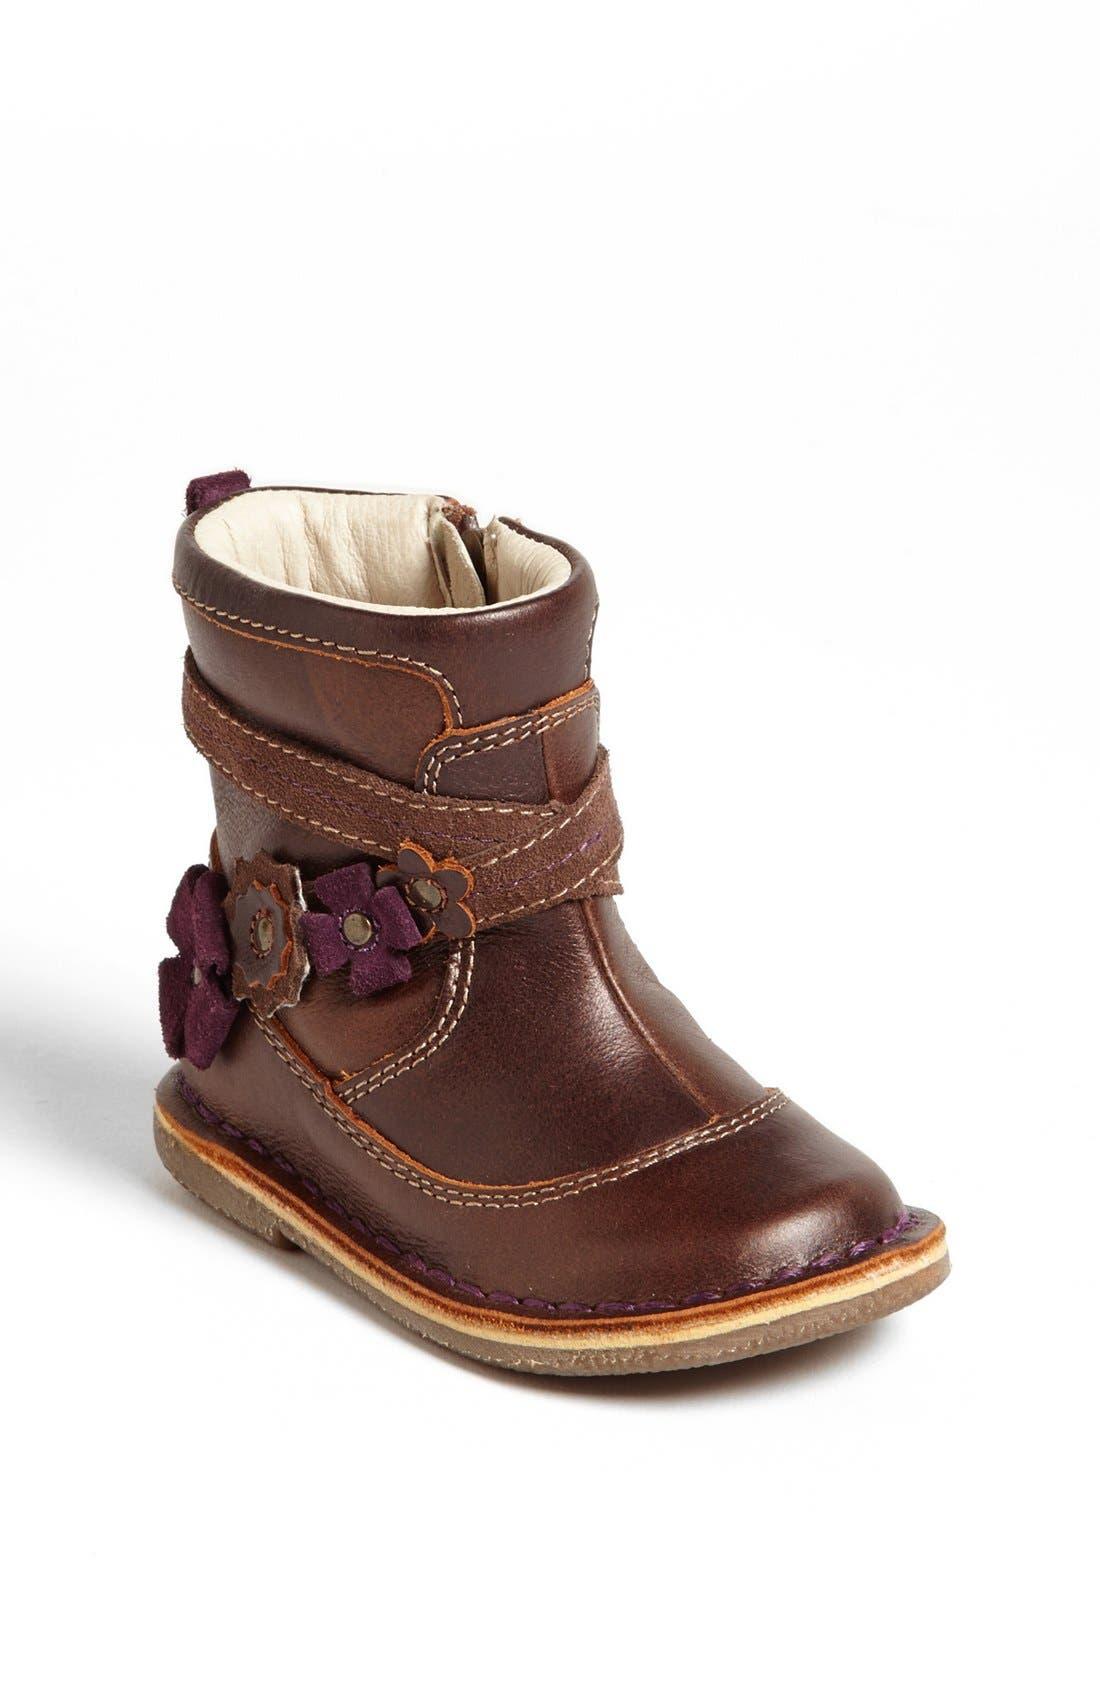 Alternate Image 1 Selected - Stride Rite 'Medallion Collection - Roslin' Boot (Baby, Walker & Toddler)